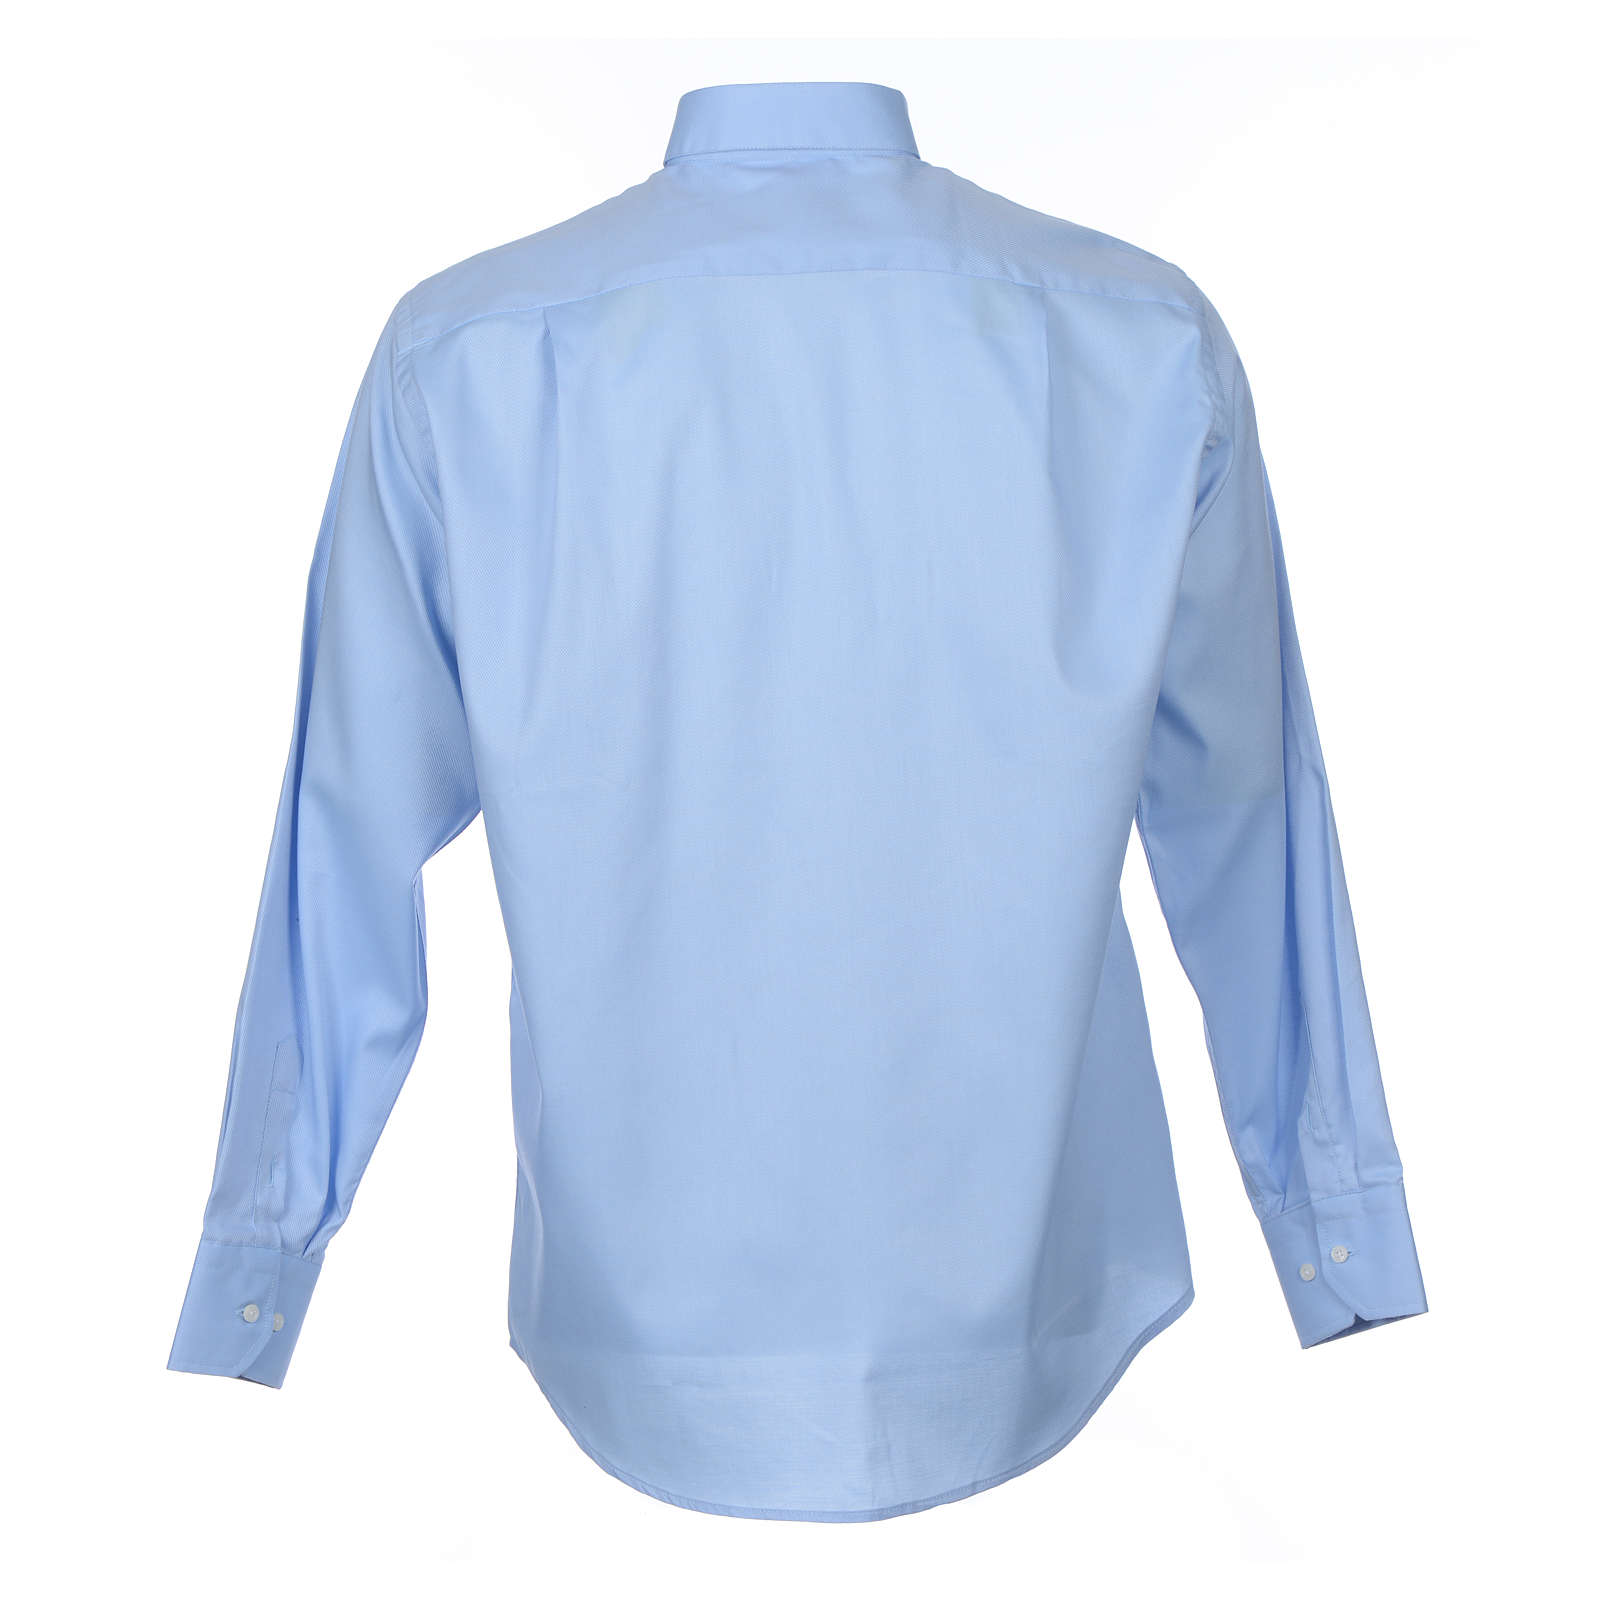 Camicia clergy M. Lunga Facile stiro Diagonale Misto cotone Celeste 4